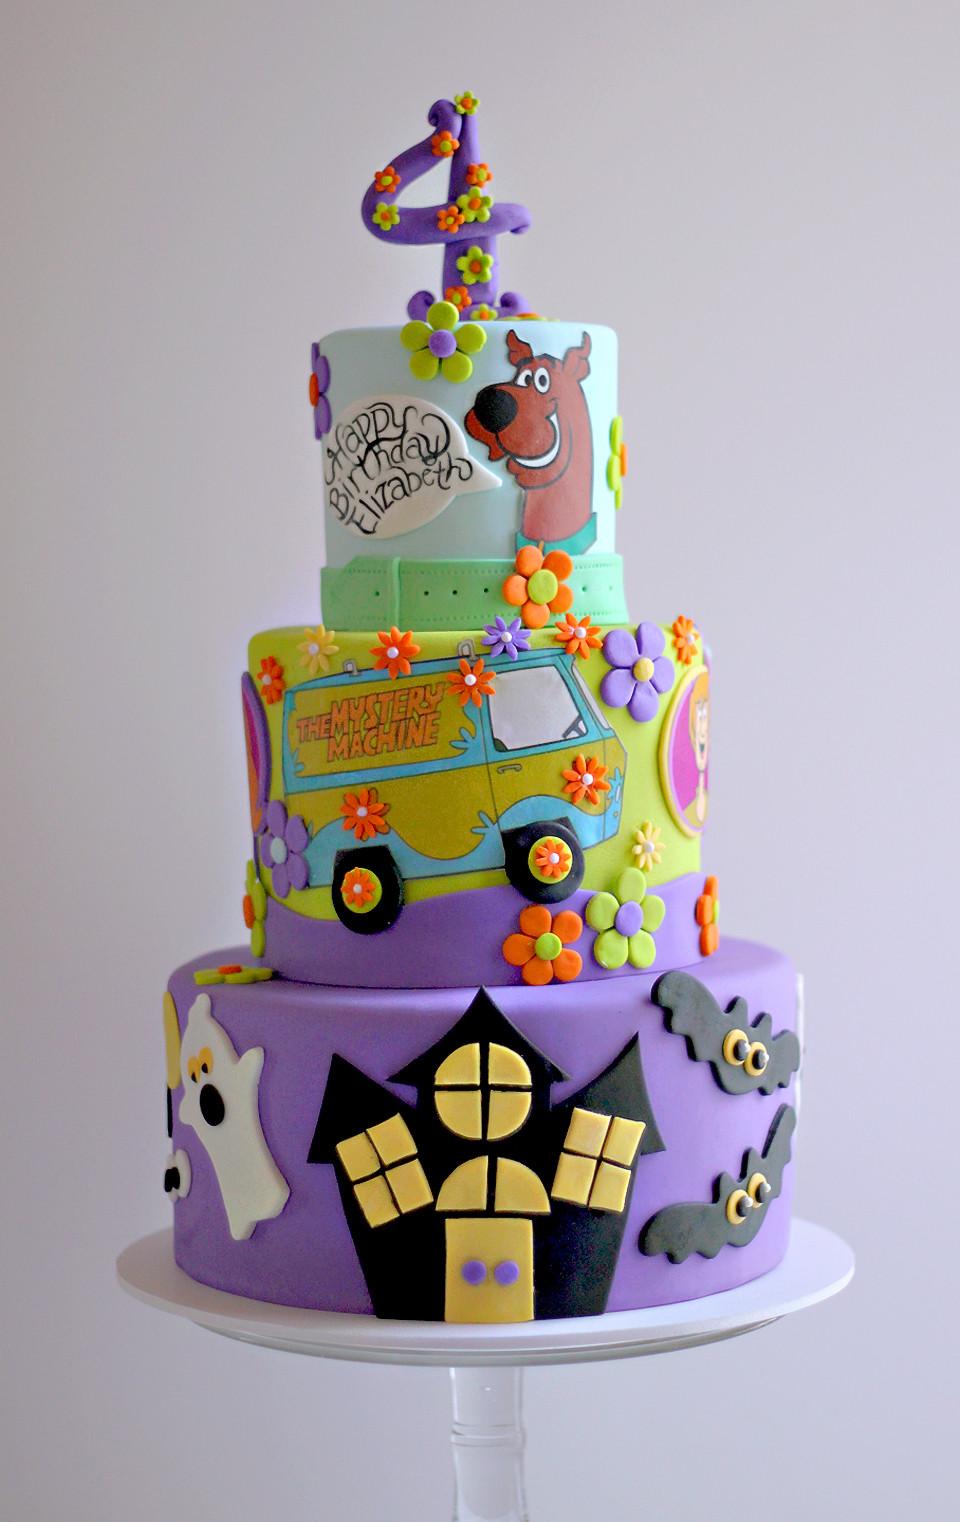 Scooby Doo Birthday Cakes  Elizabeth's Scooby Birthday Cake